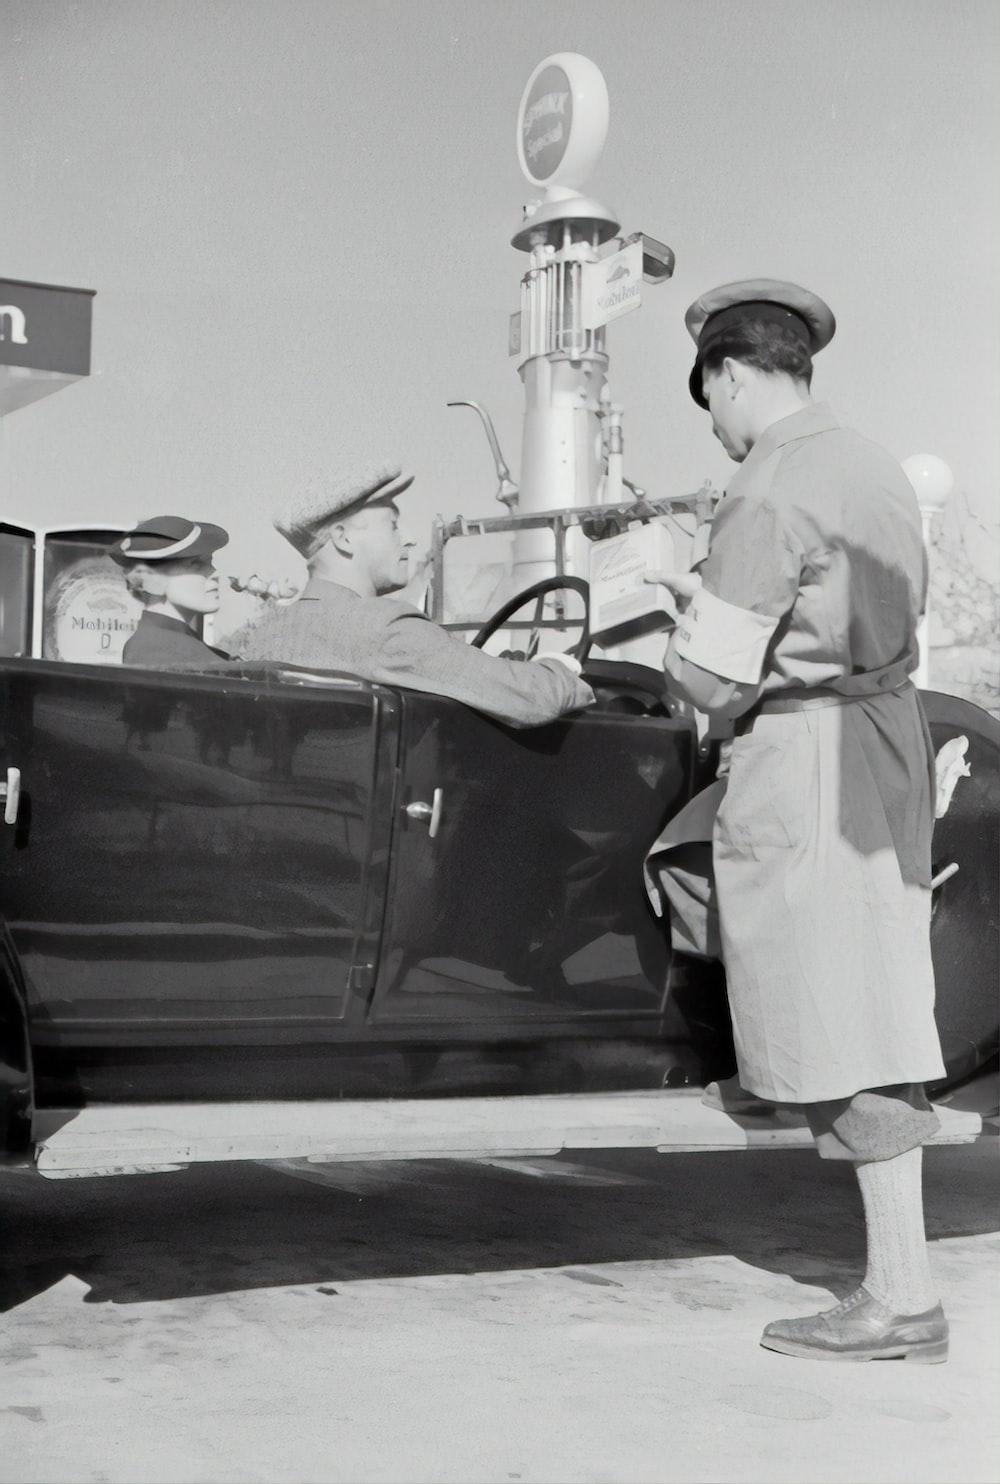 man in white uniform standing beside black car